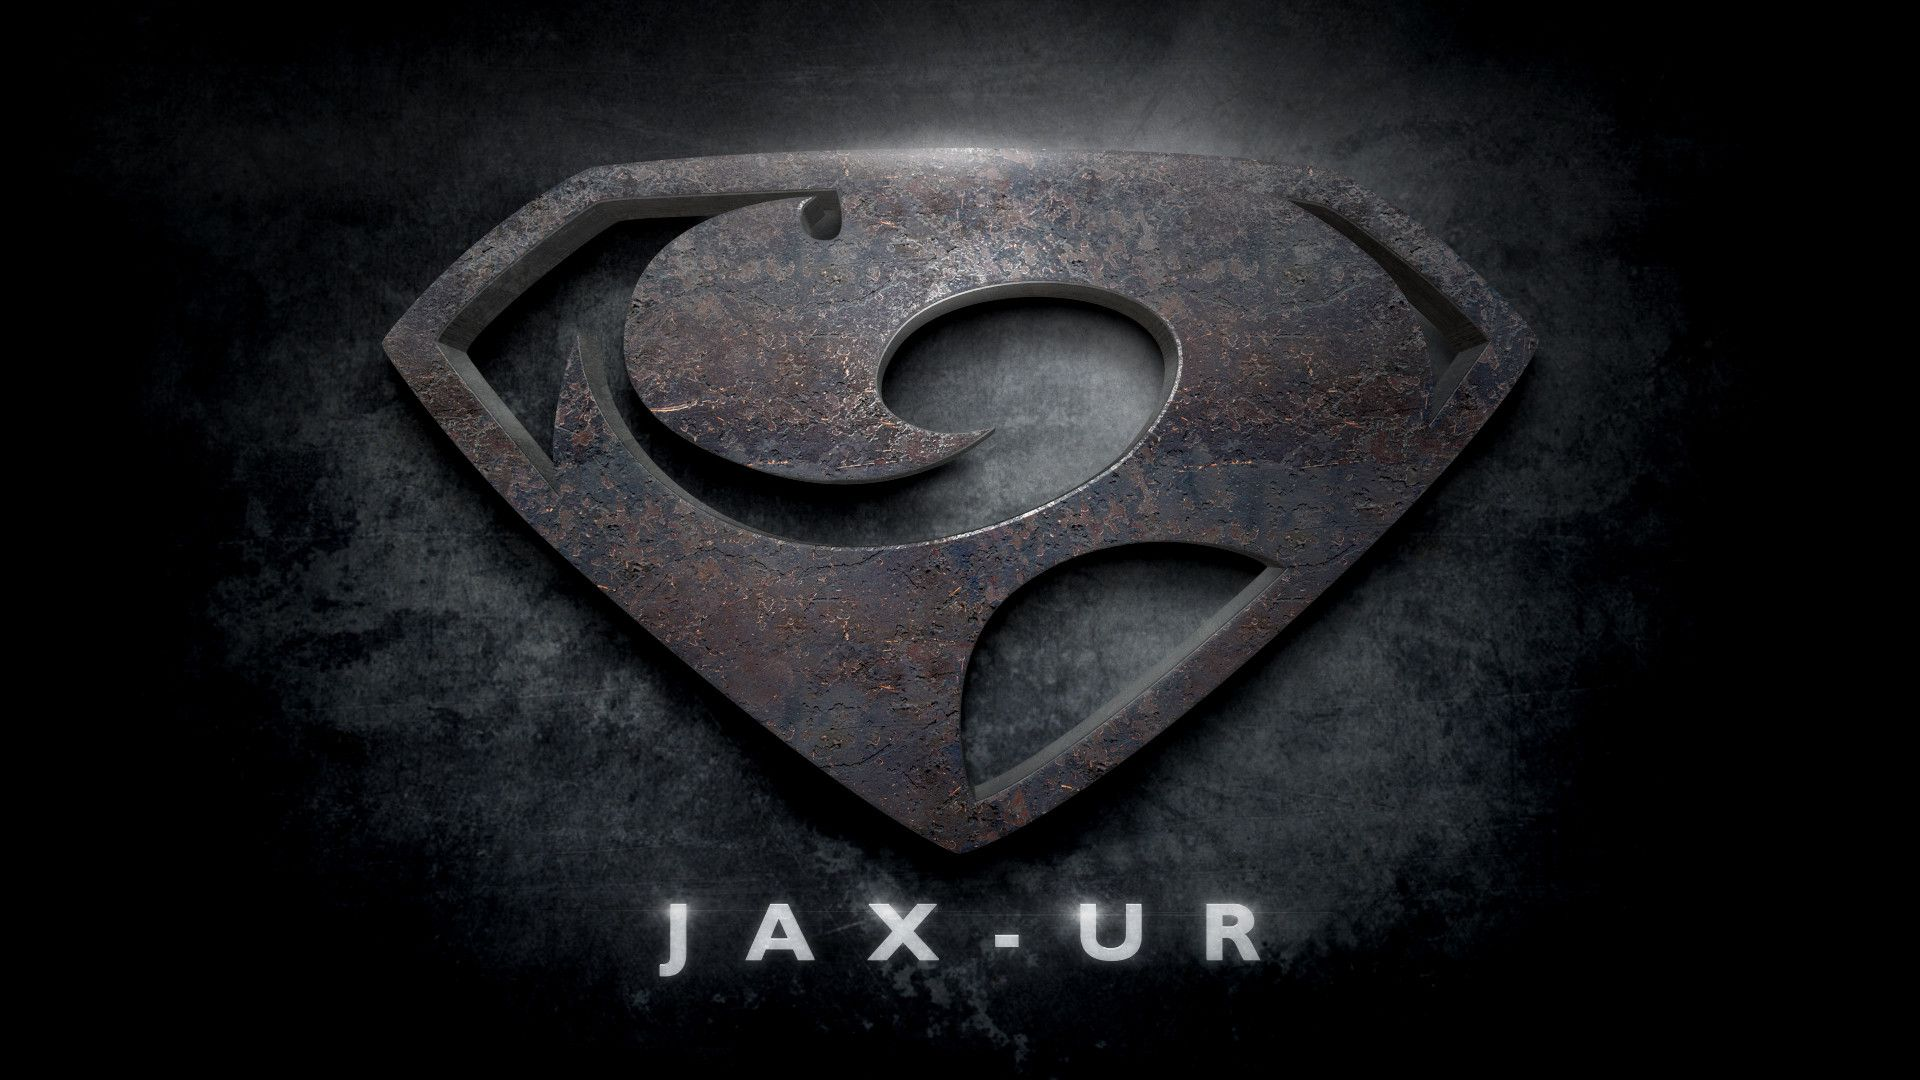 Jax urs glyph from man of steel dc universe logos pinterest jax urs glyph from man of steel biocorpaavc